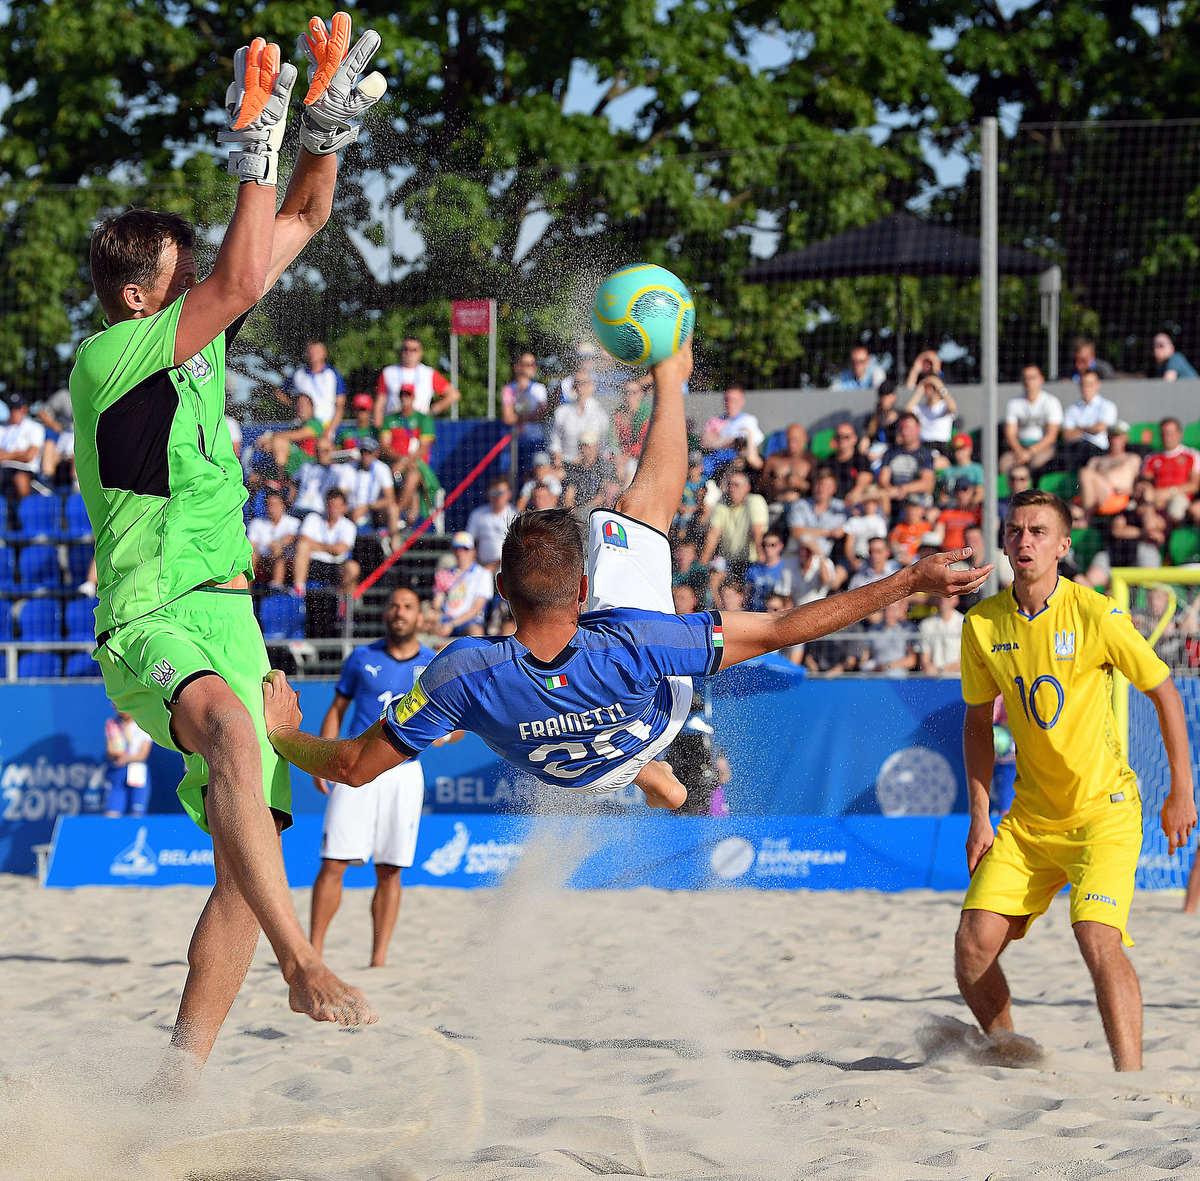 beachsoccermezzelanigmtsport15